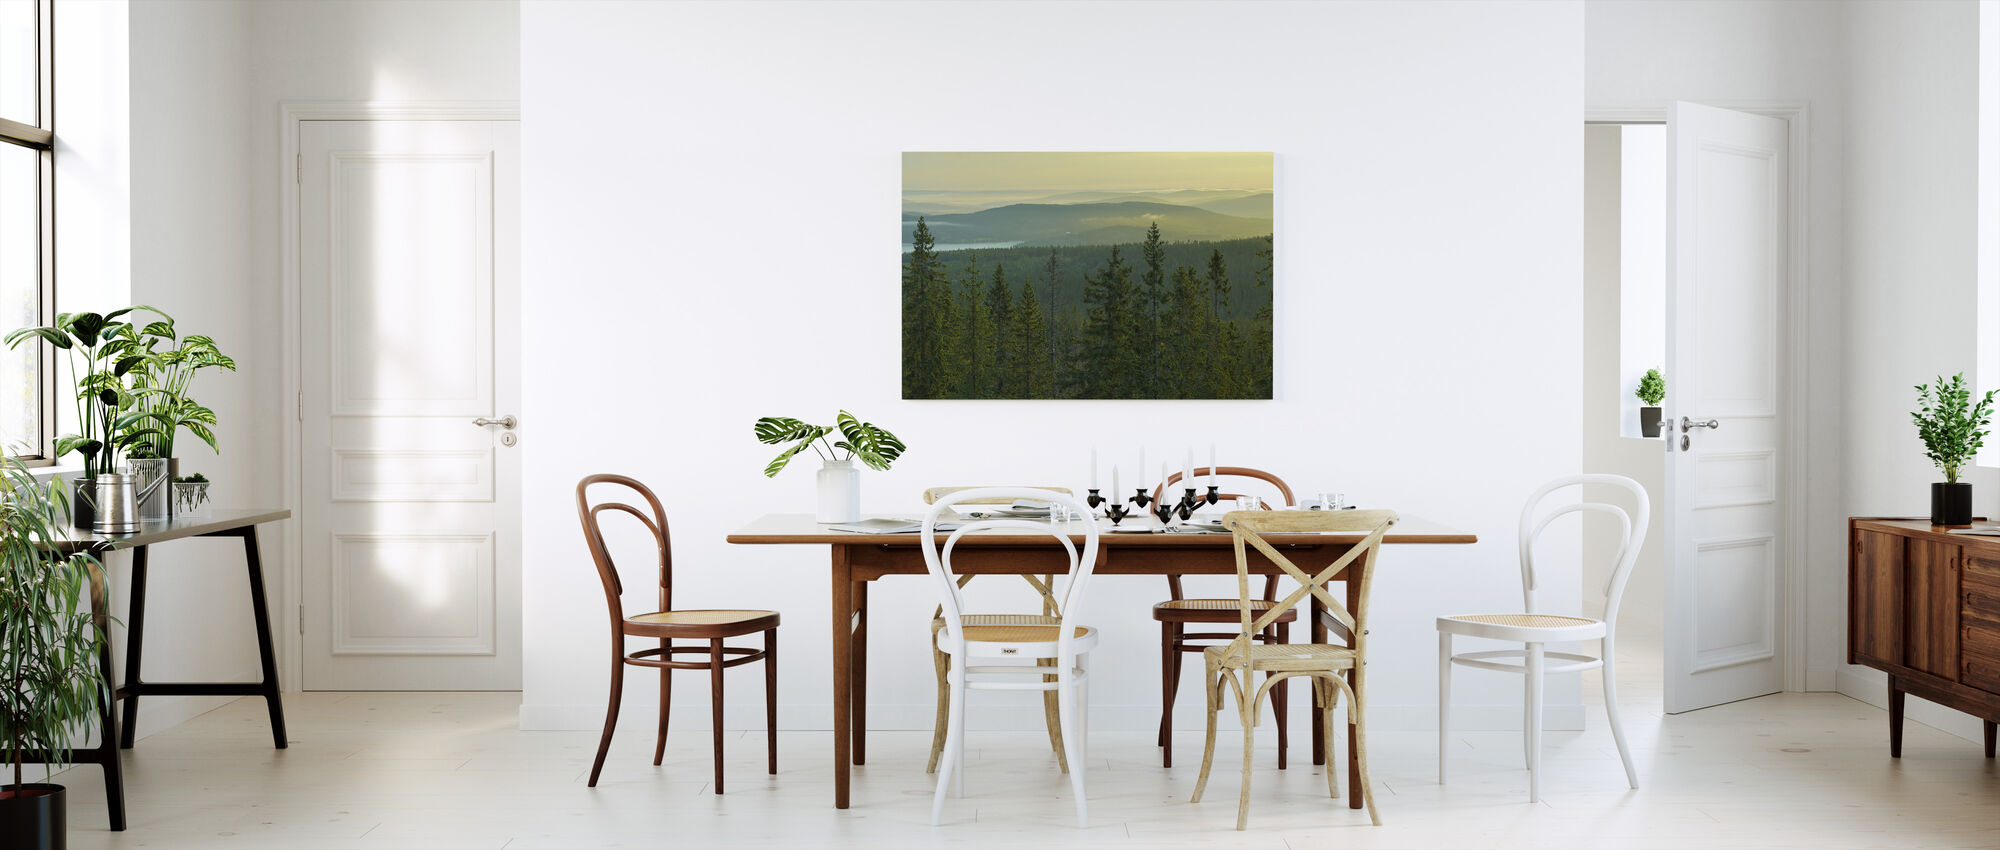 Spruce Tops in Skuleskogen National Park, Sweden - Canvas print - Kitchen